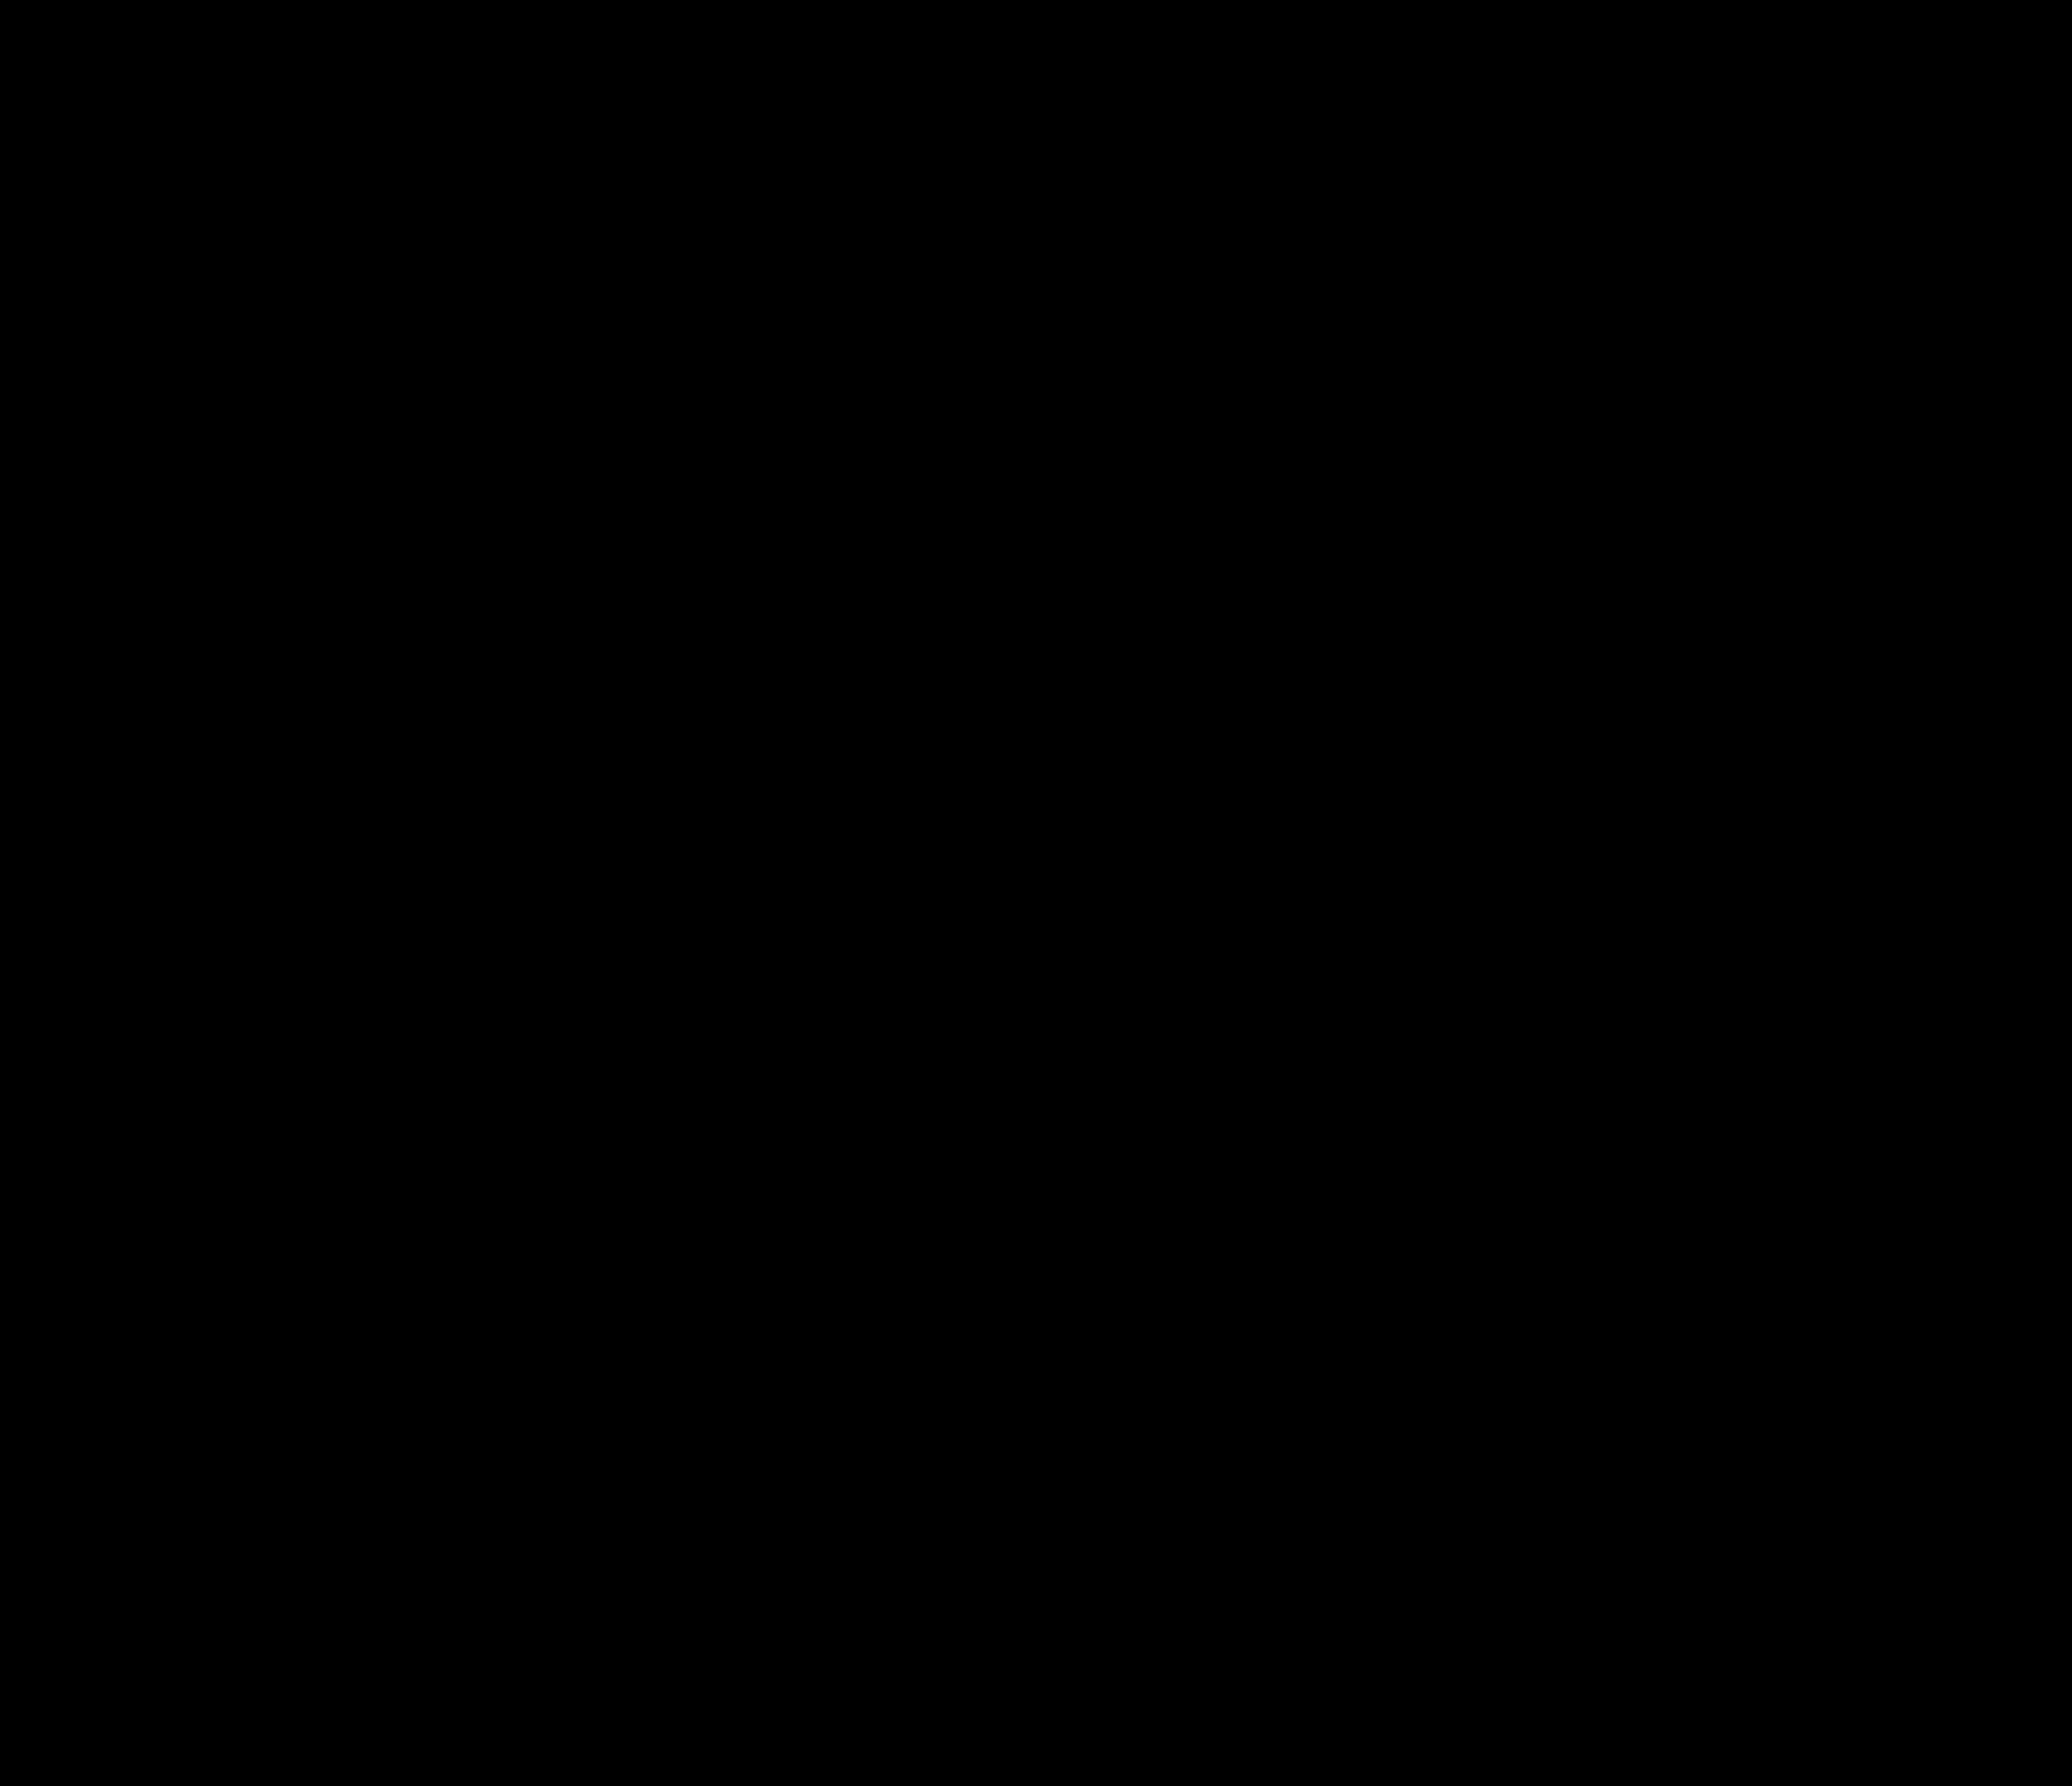 2242x1932 Clipart